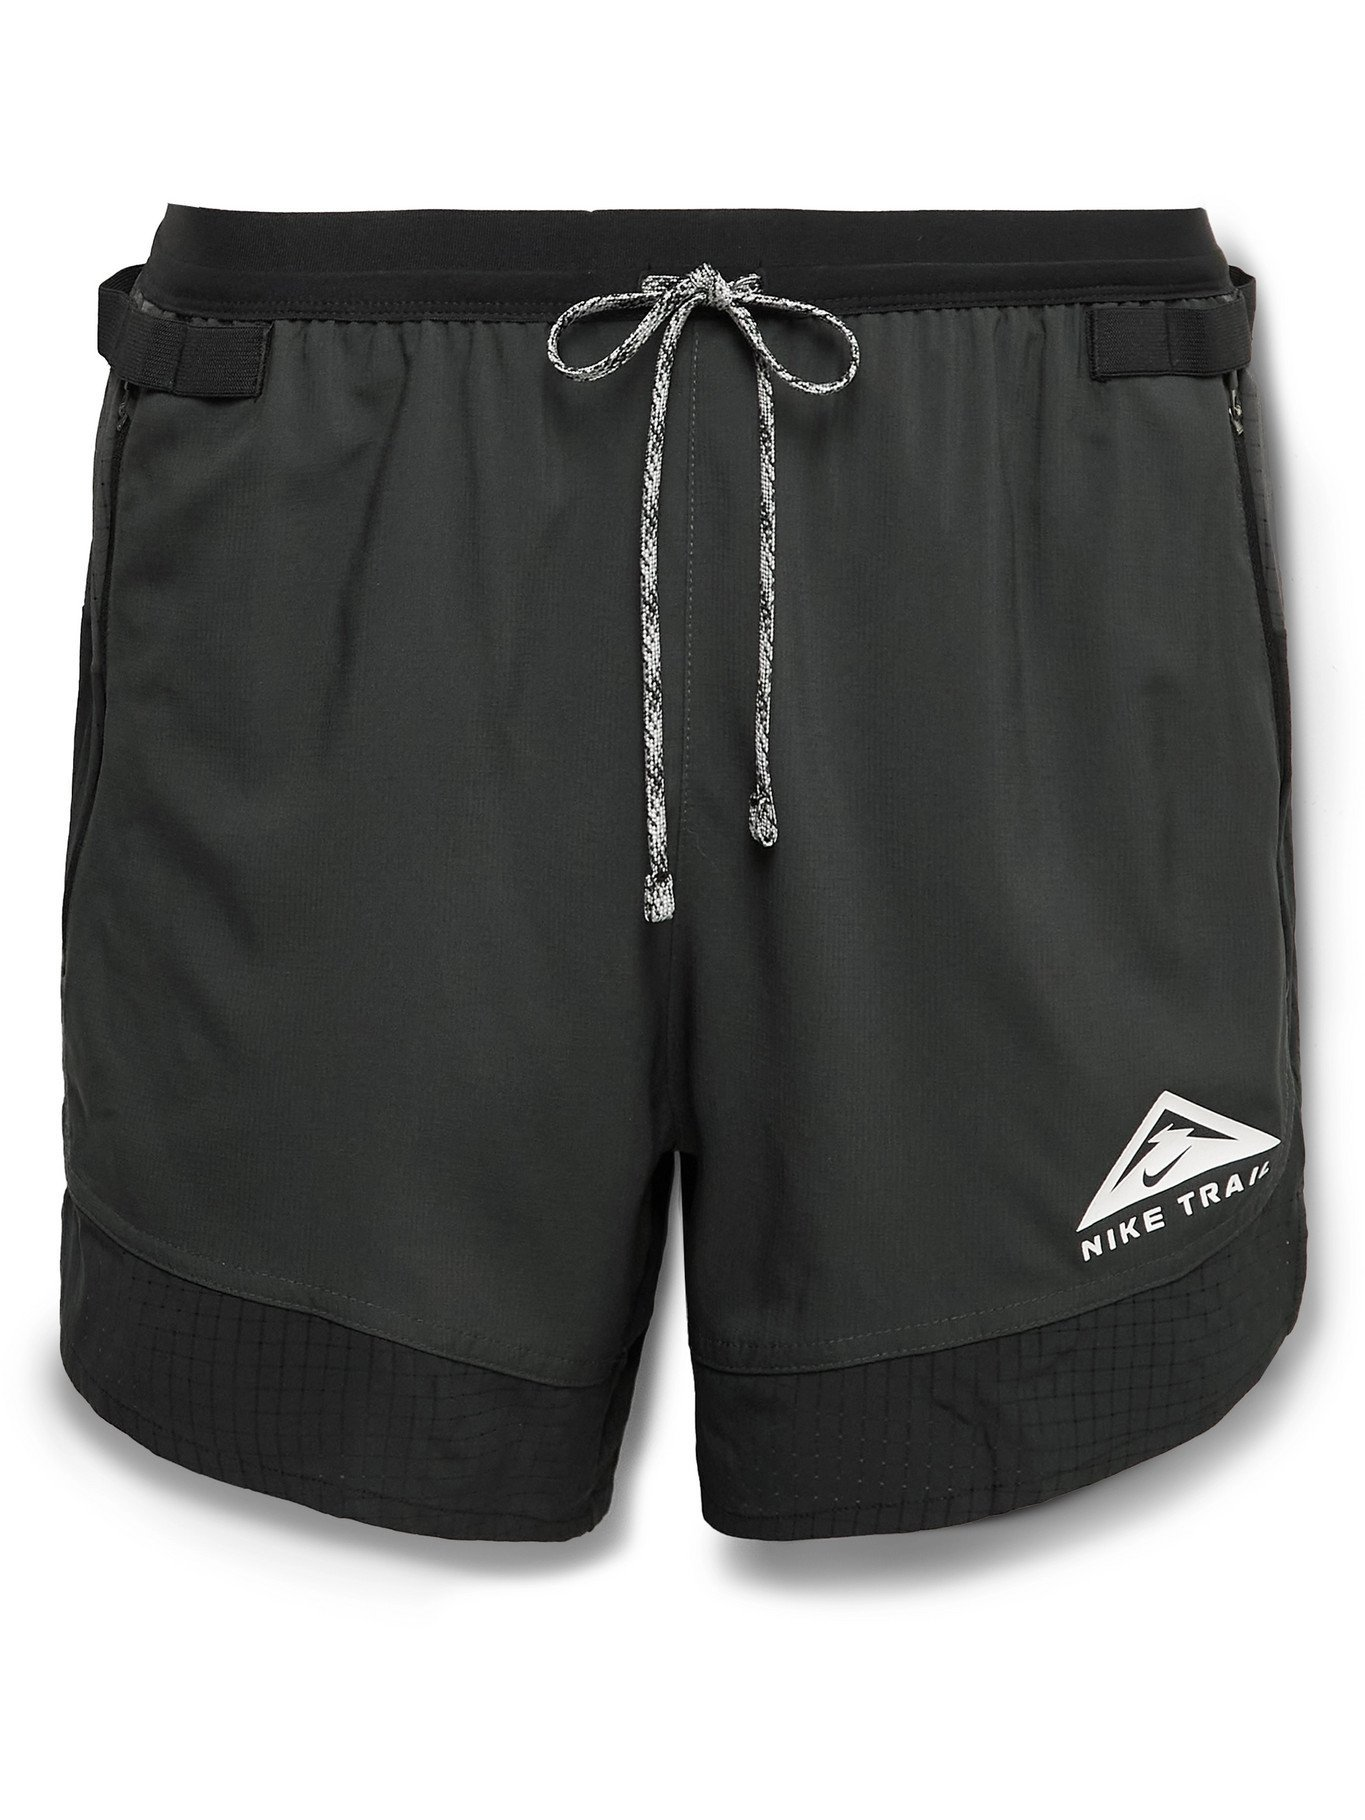 NIKE RUNNING - Flex Stride Dri-FIT Ripstop Shorts - Black - S